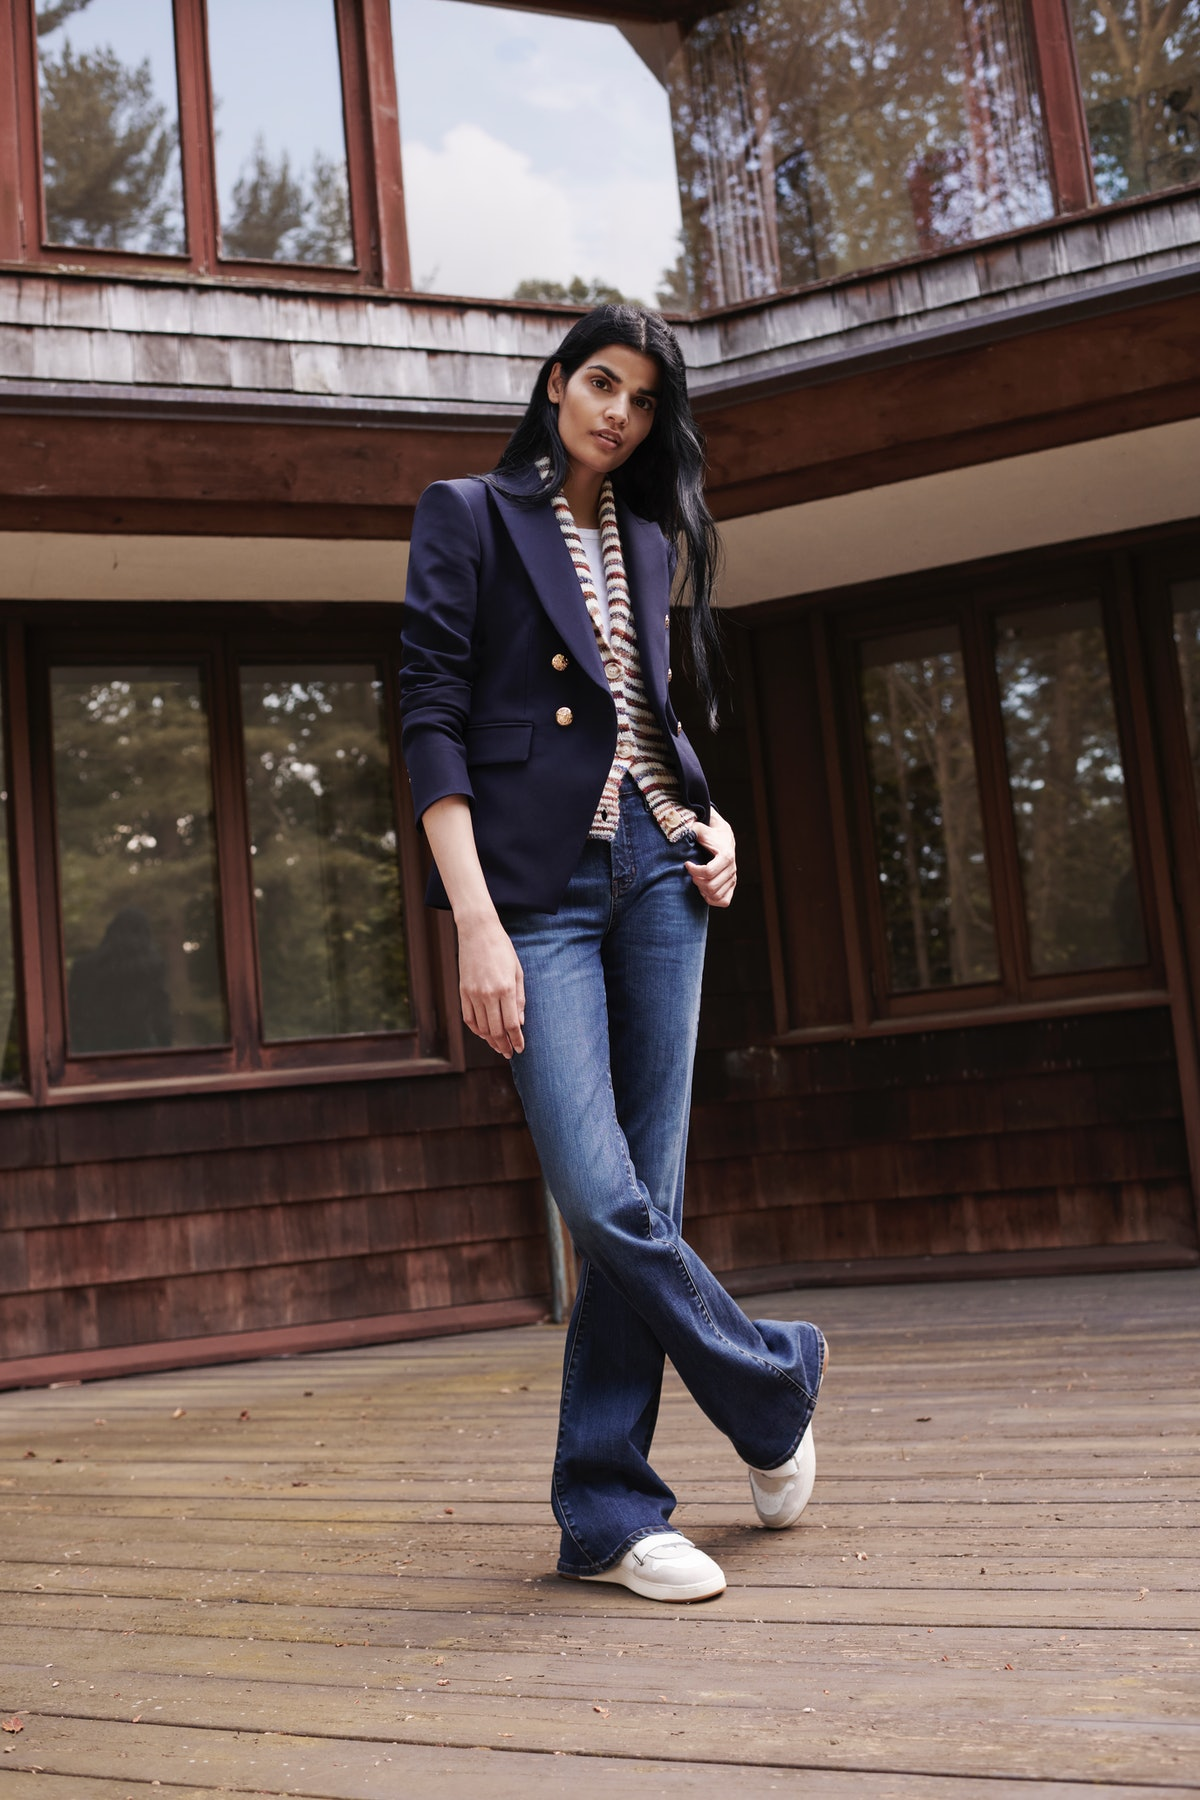 Model wearing blazer and cardigan by Veronica Beard.